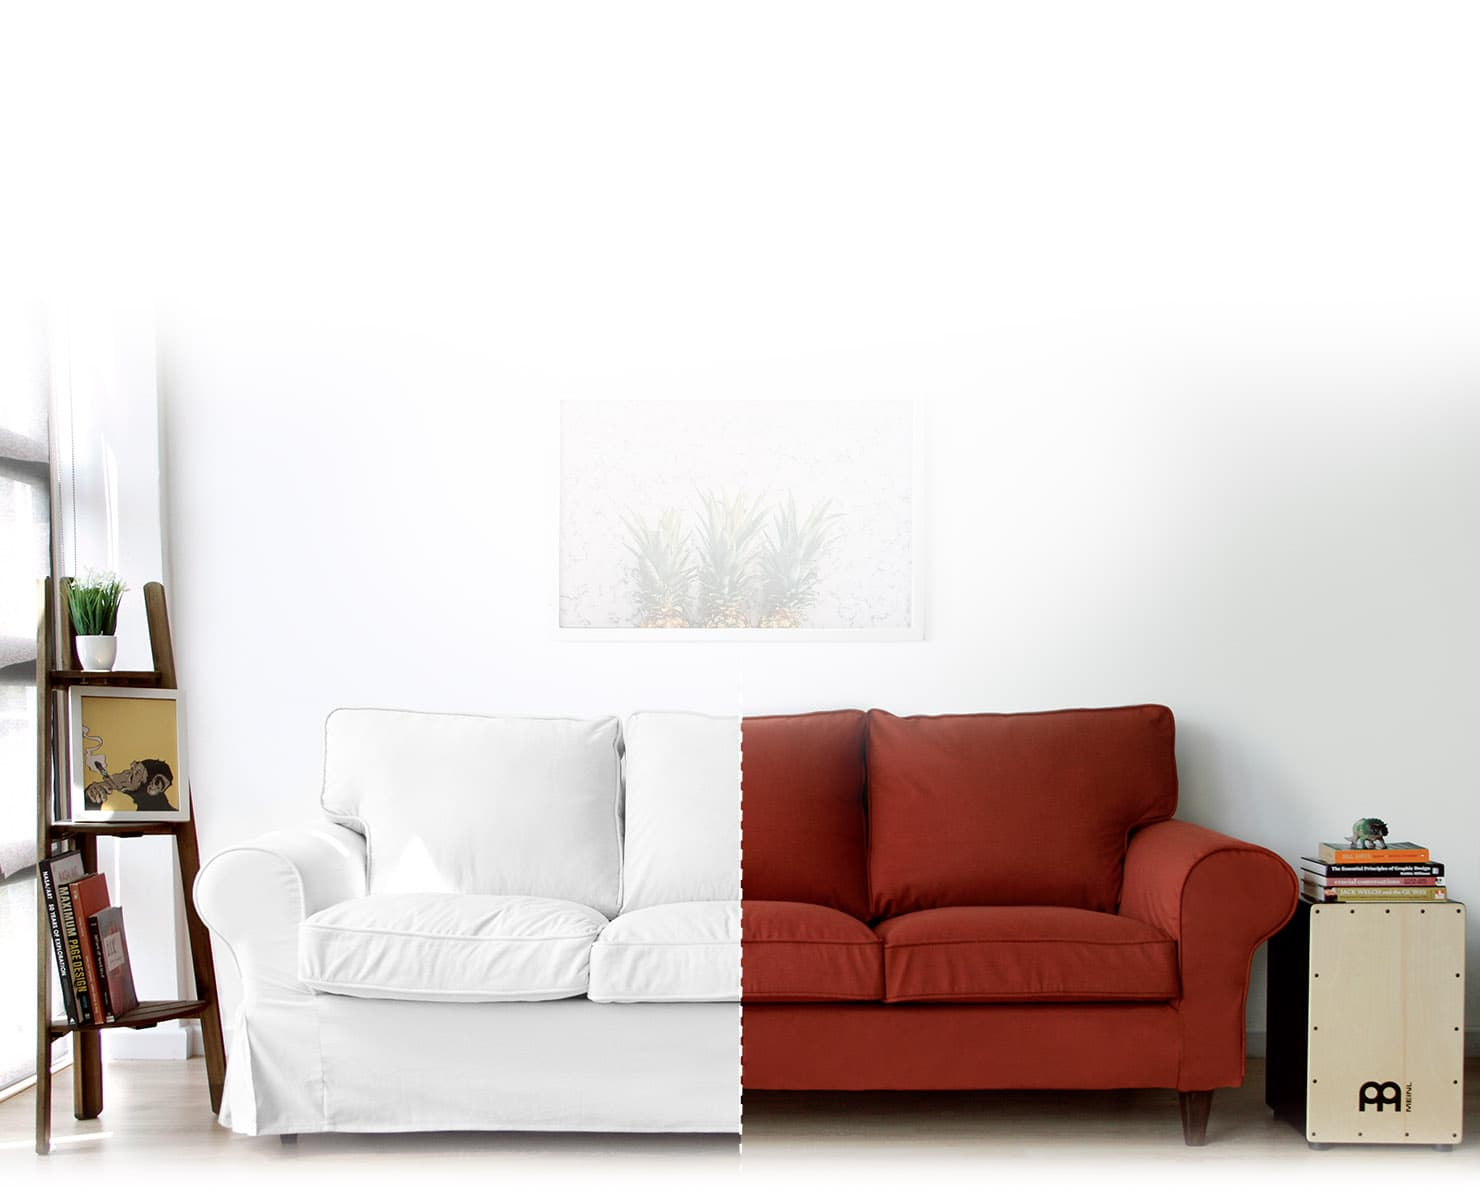 IKEA Ektorp in Gaia White Skirted and Shire Rust Snug Fit